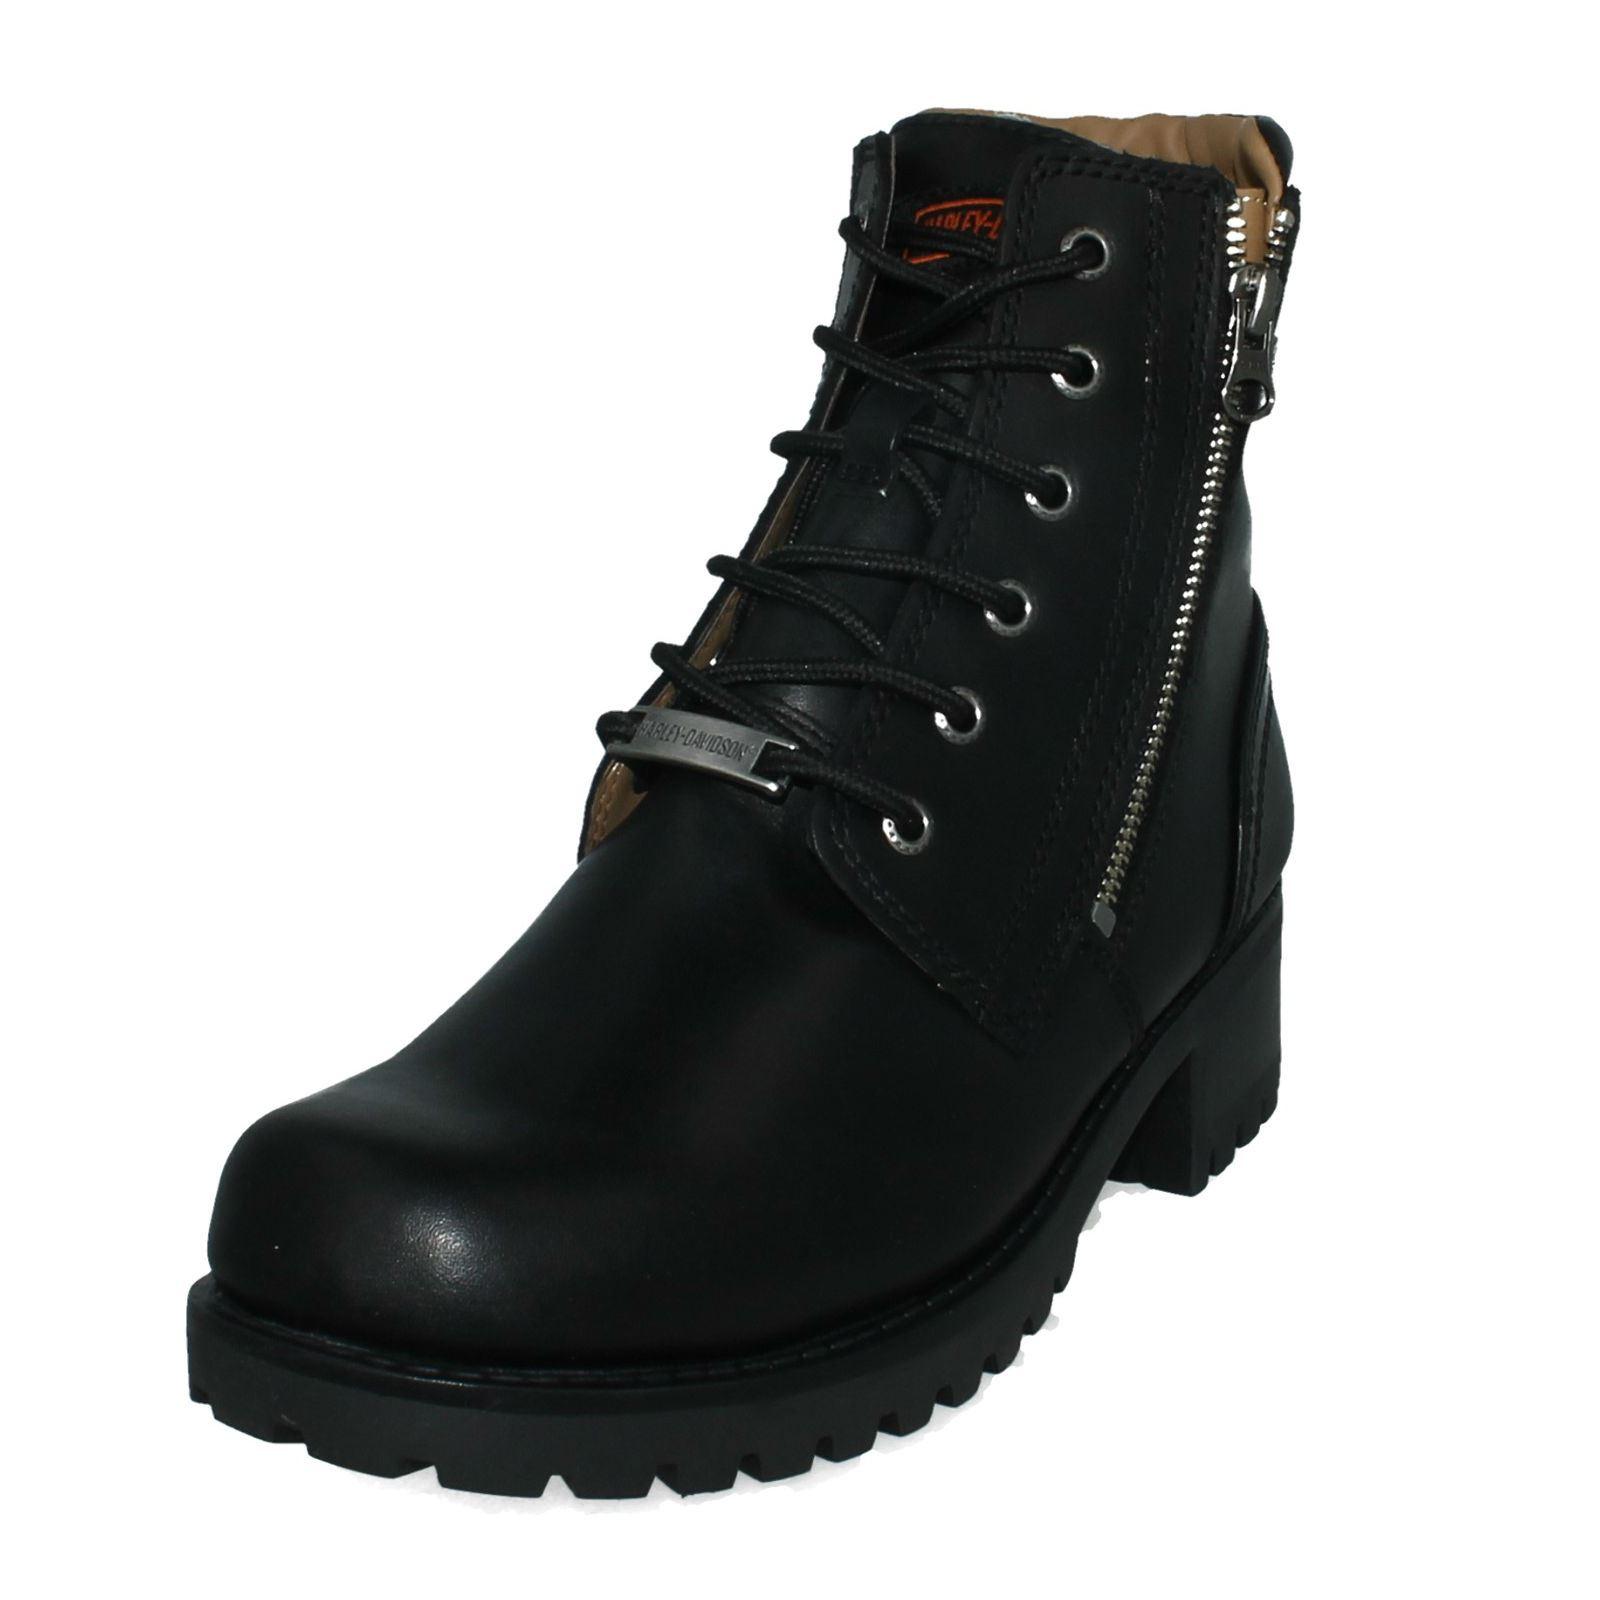 Ladies Harley Davidson Ankle Boots Asher - W W - da8169